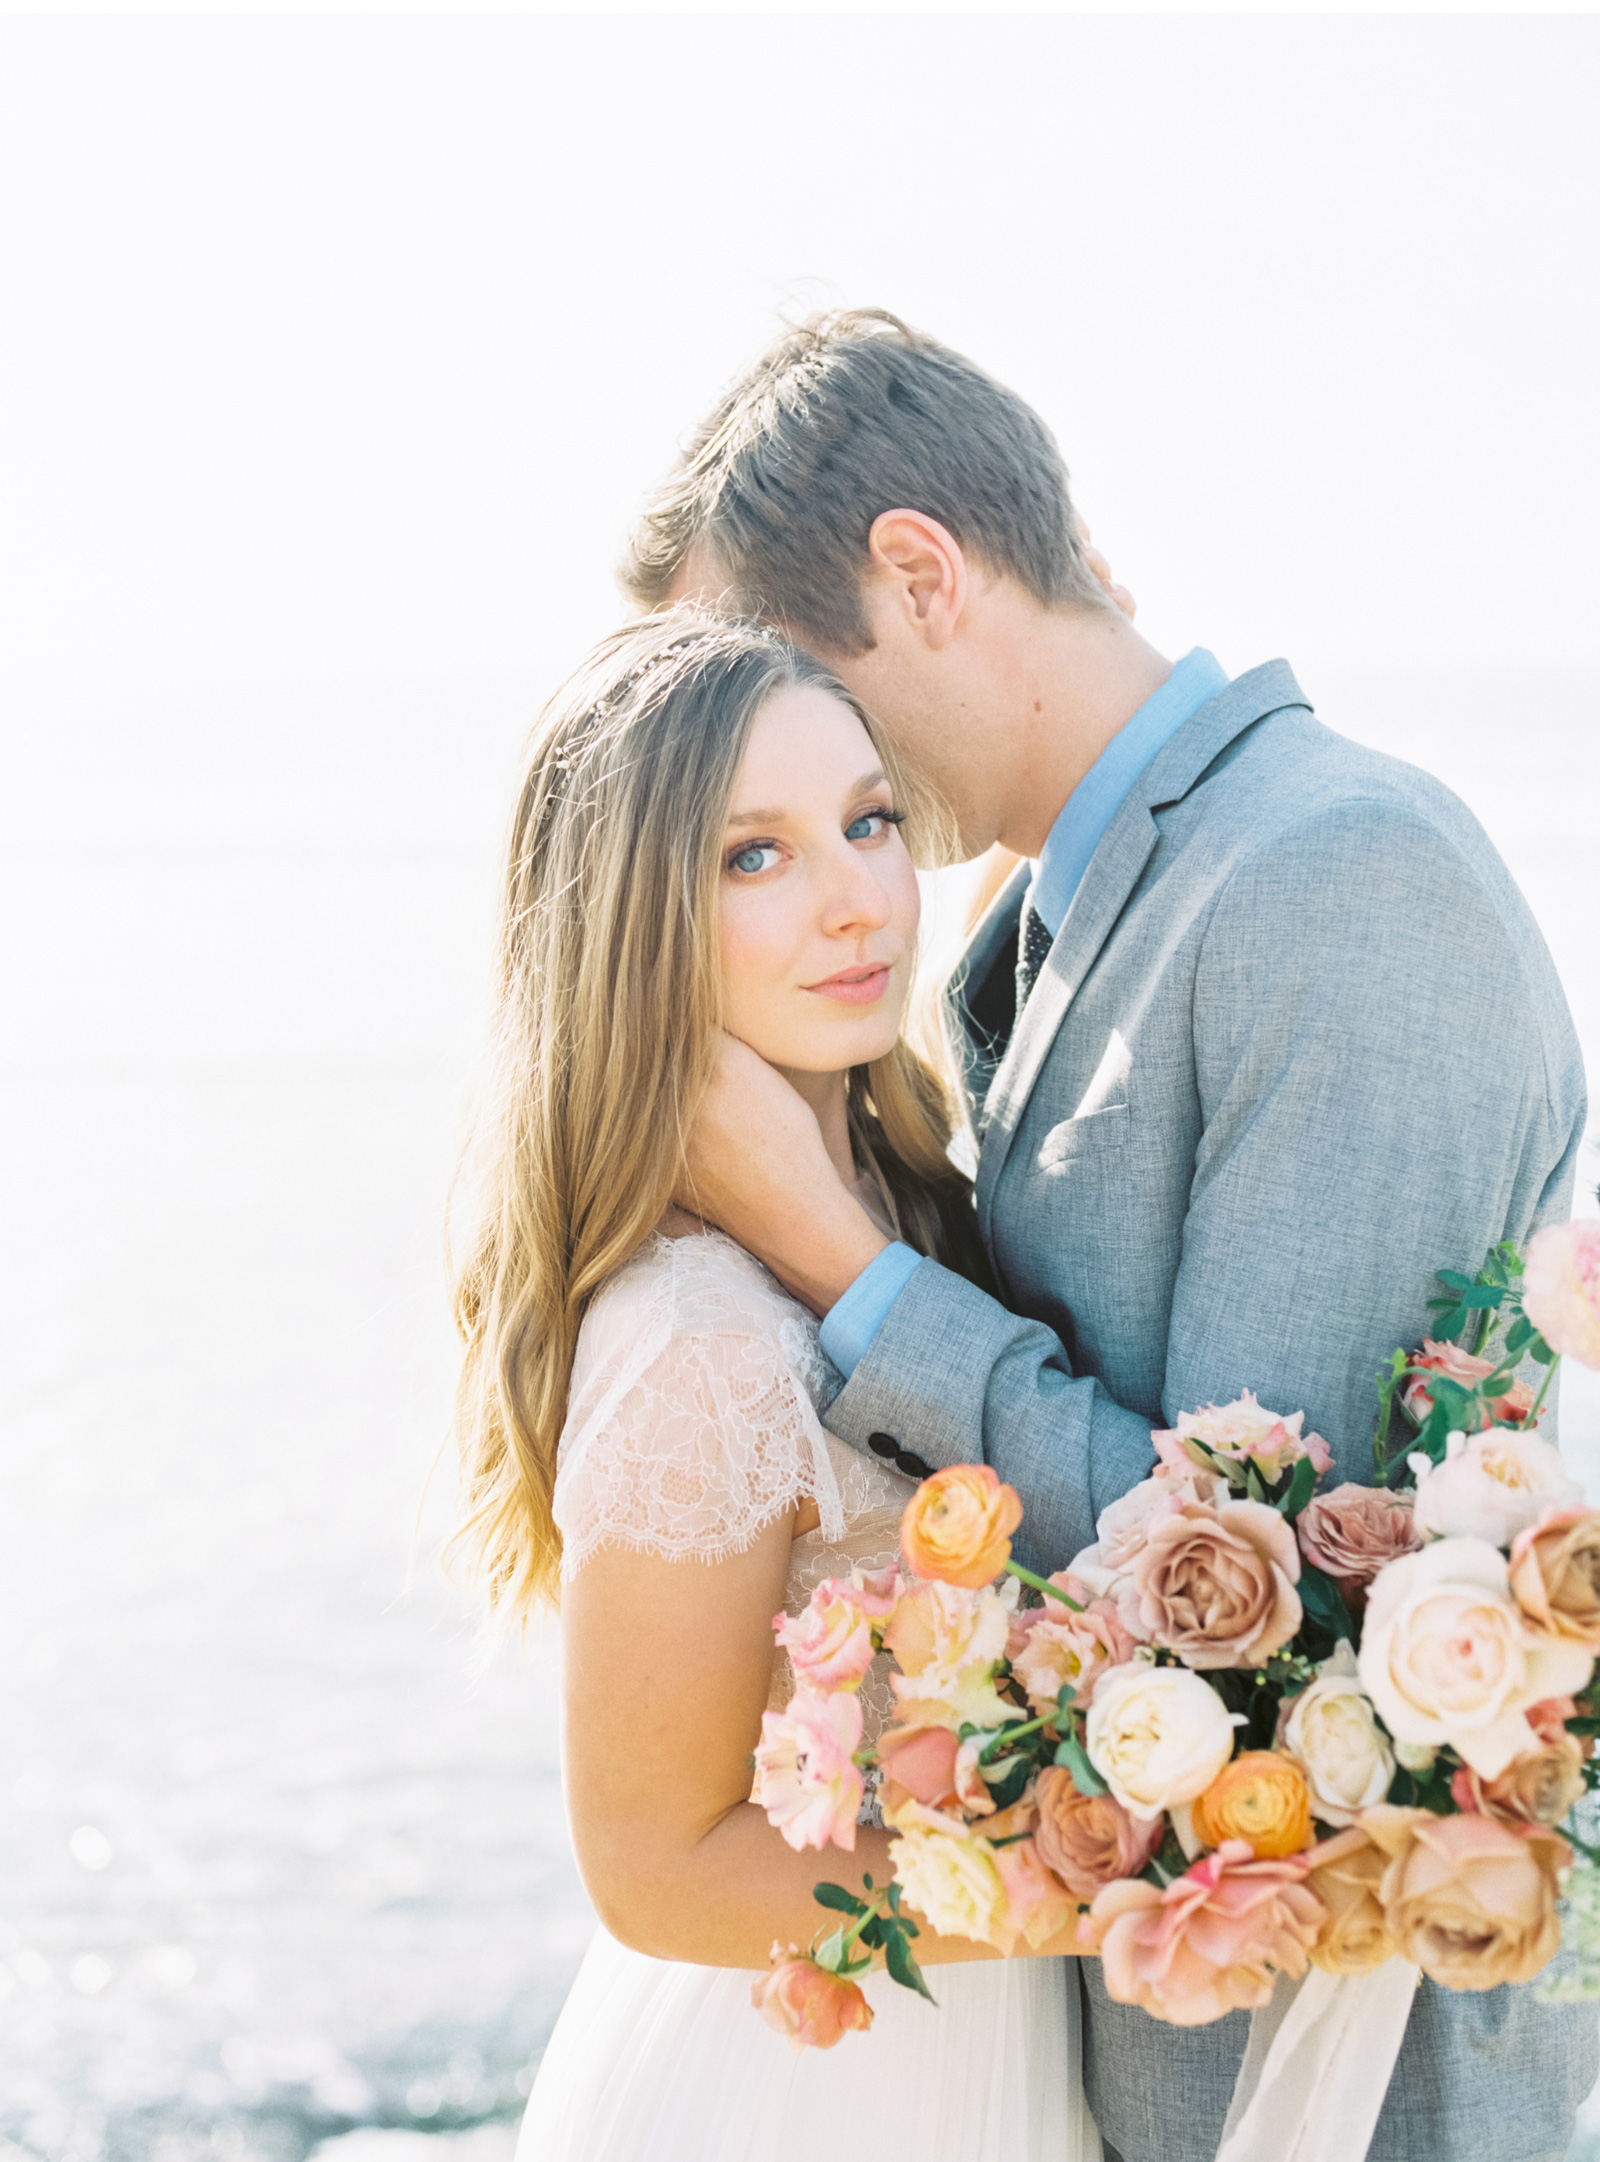 Style-Me-Pretty-California-Beach-Wedding-Natalie-Schutt-Photography_15.jpg